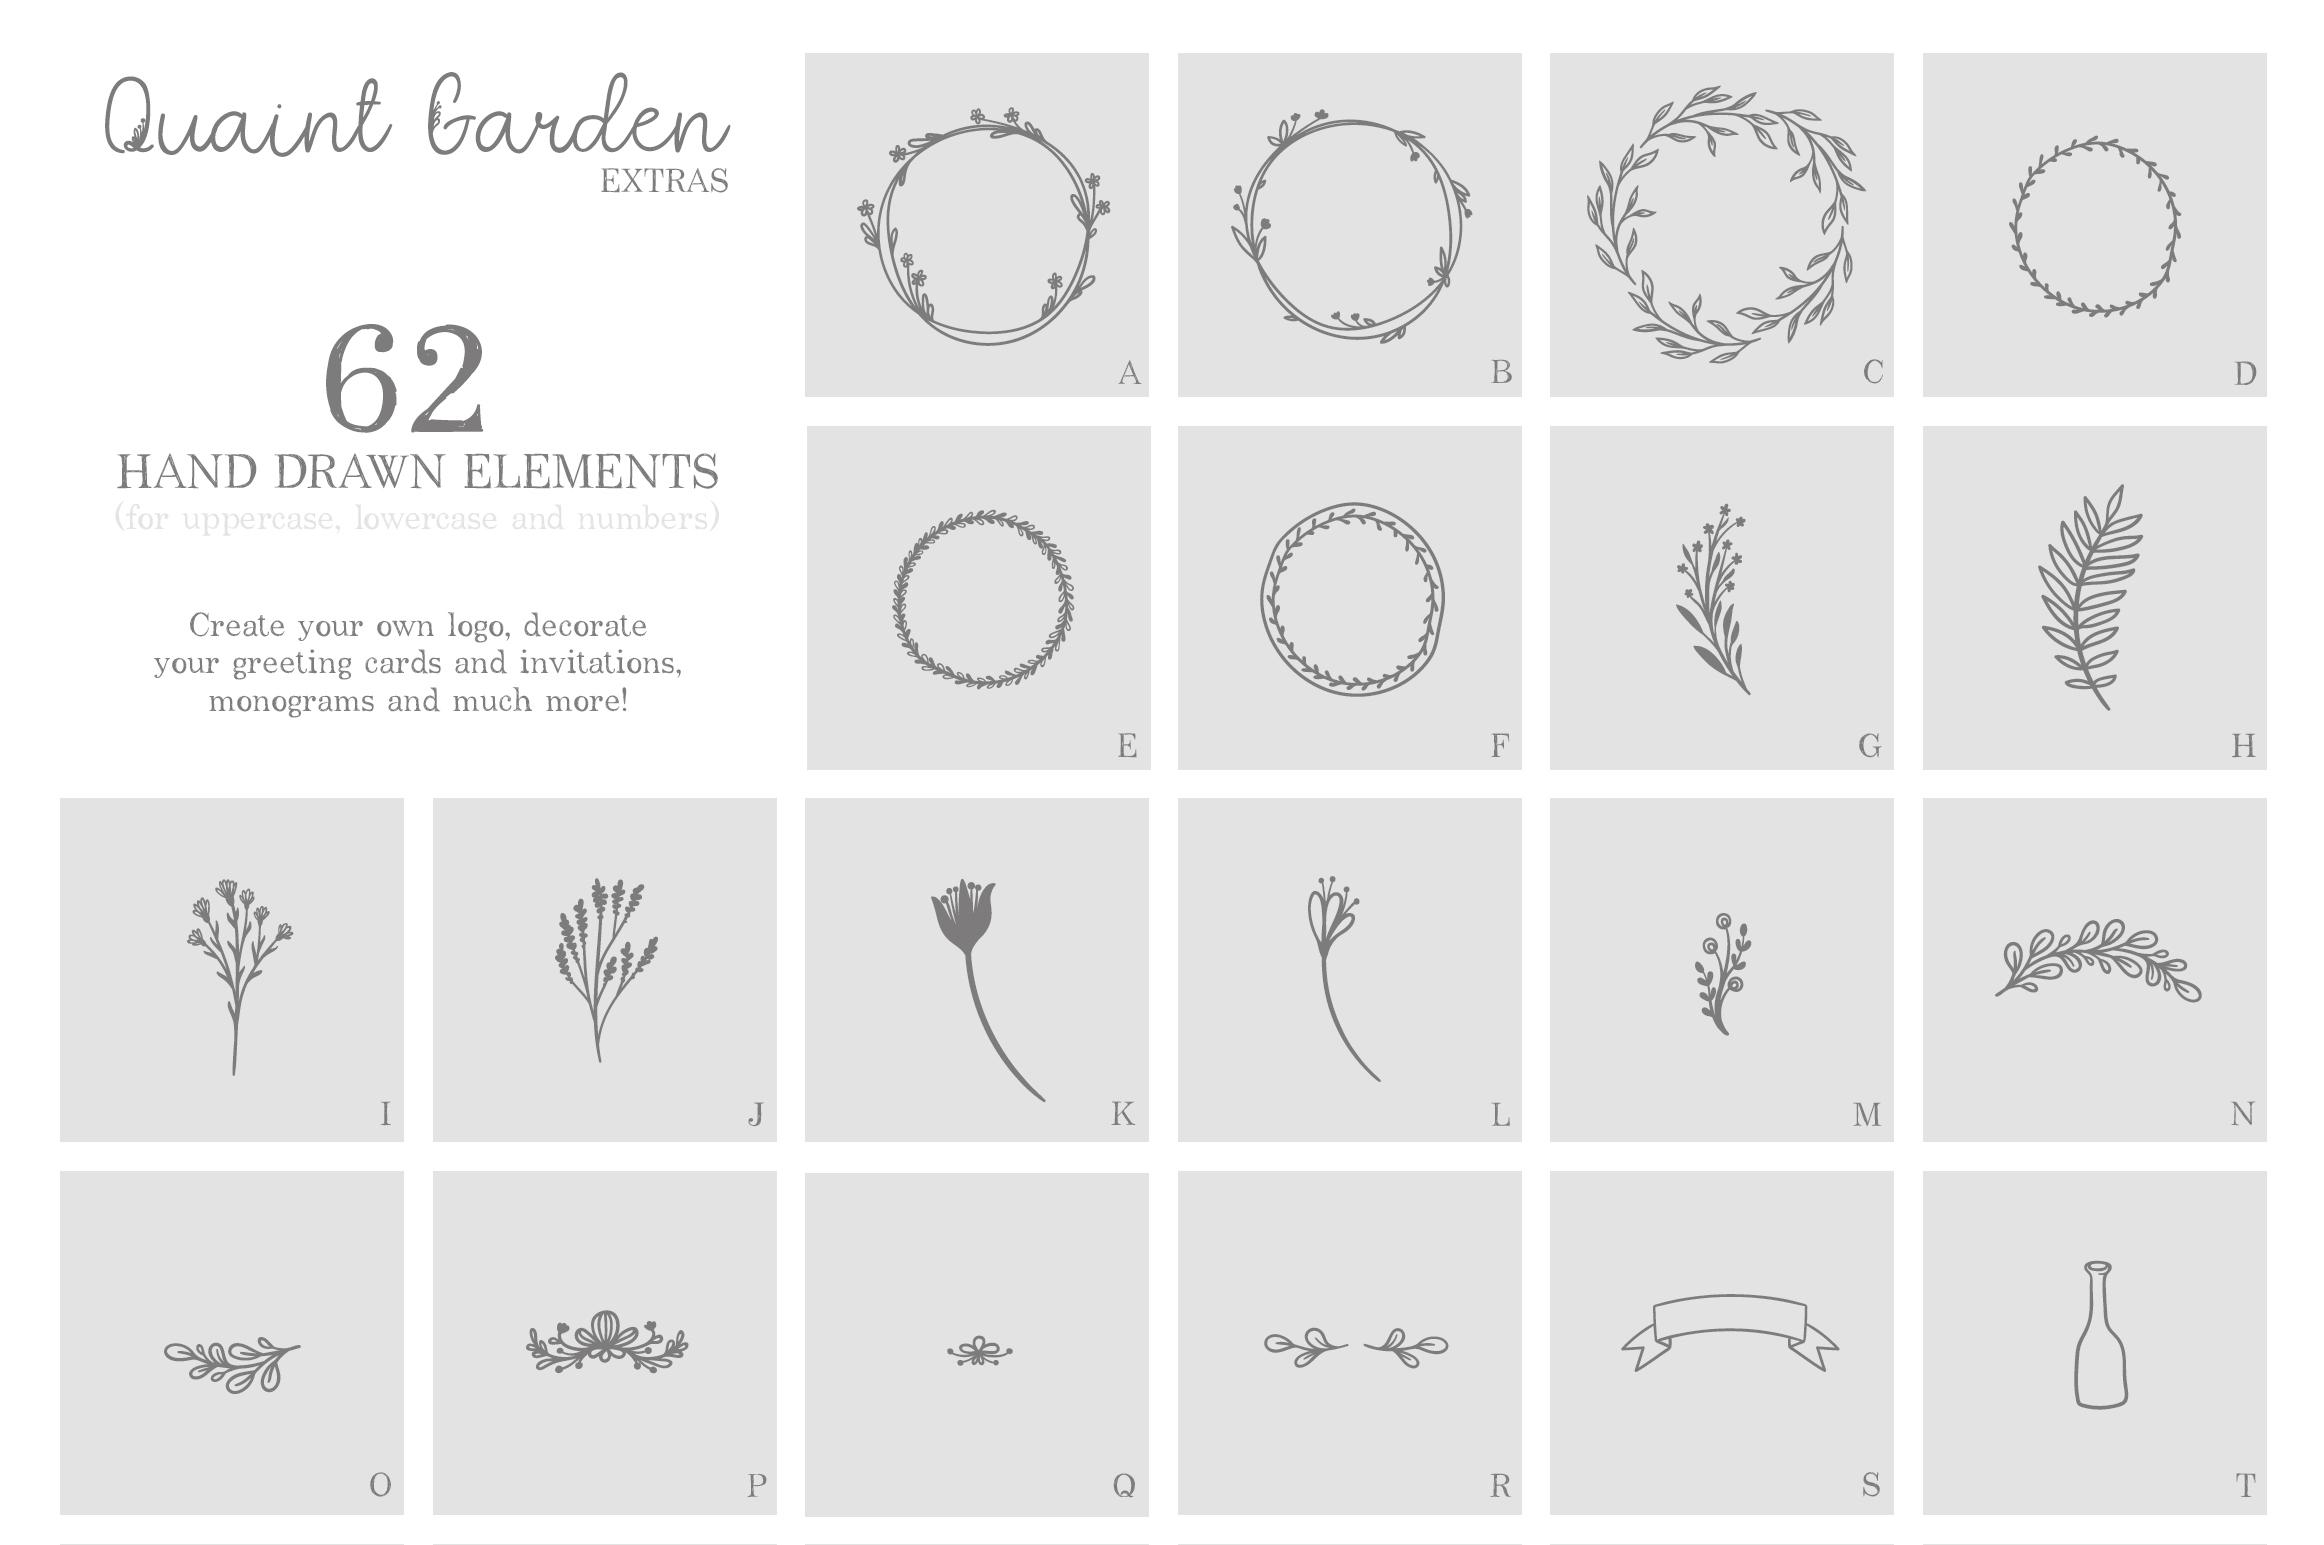 Quaint Garden Floral Font EXTRAS example image 5